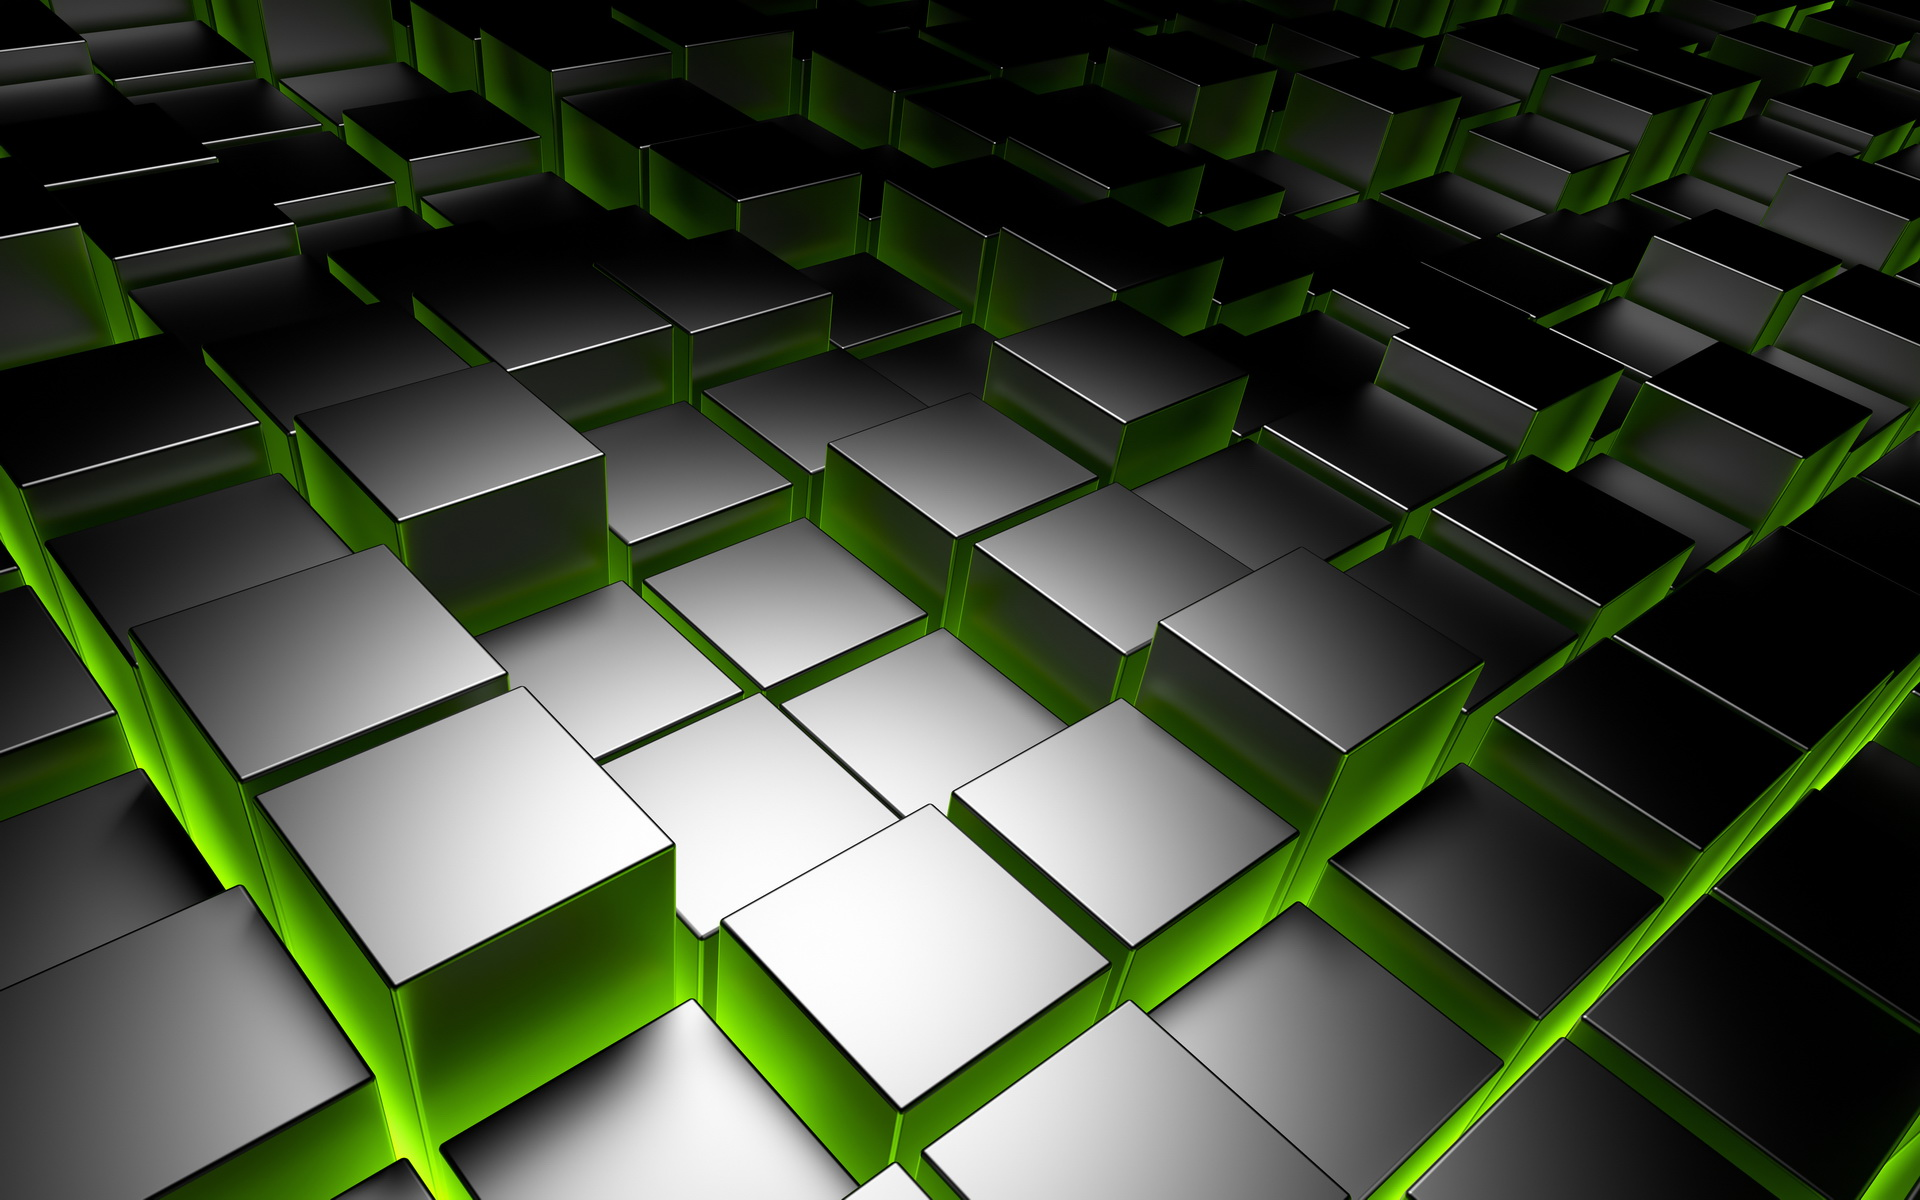 3d cube desktop effects for windows 7 free download